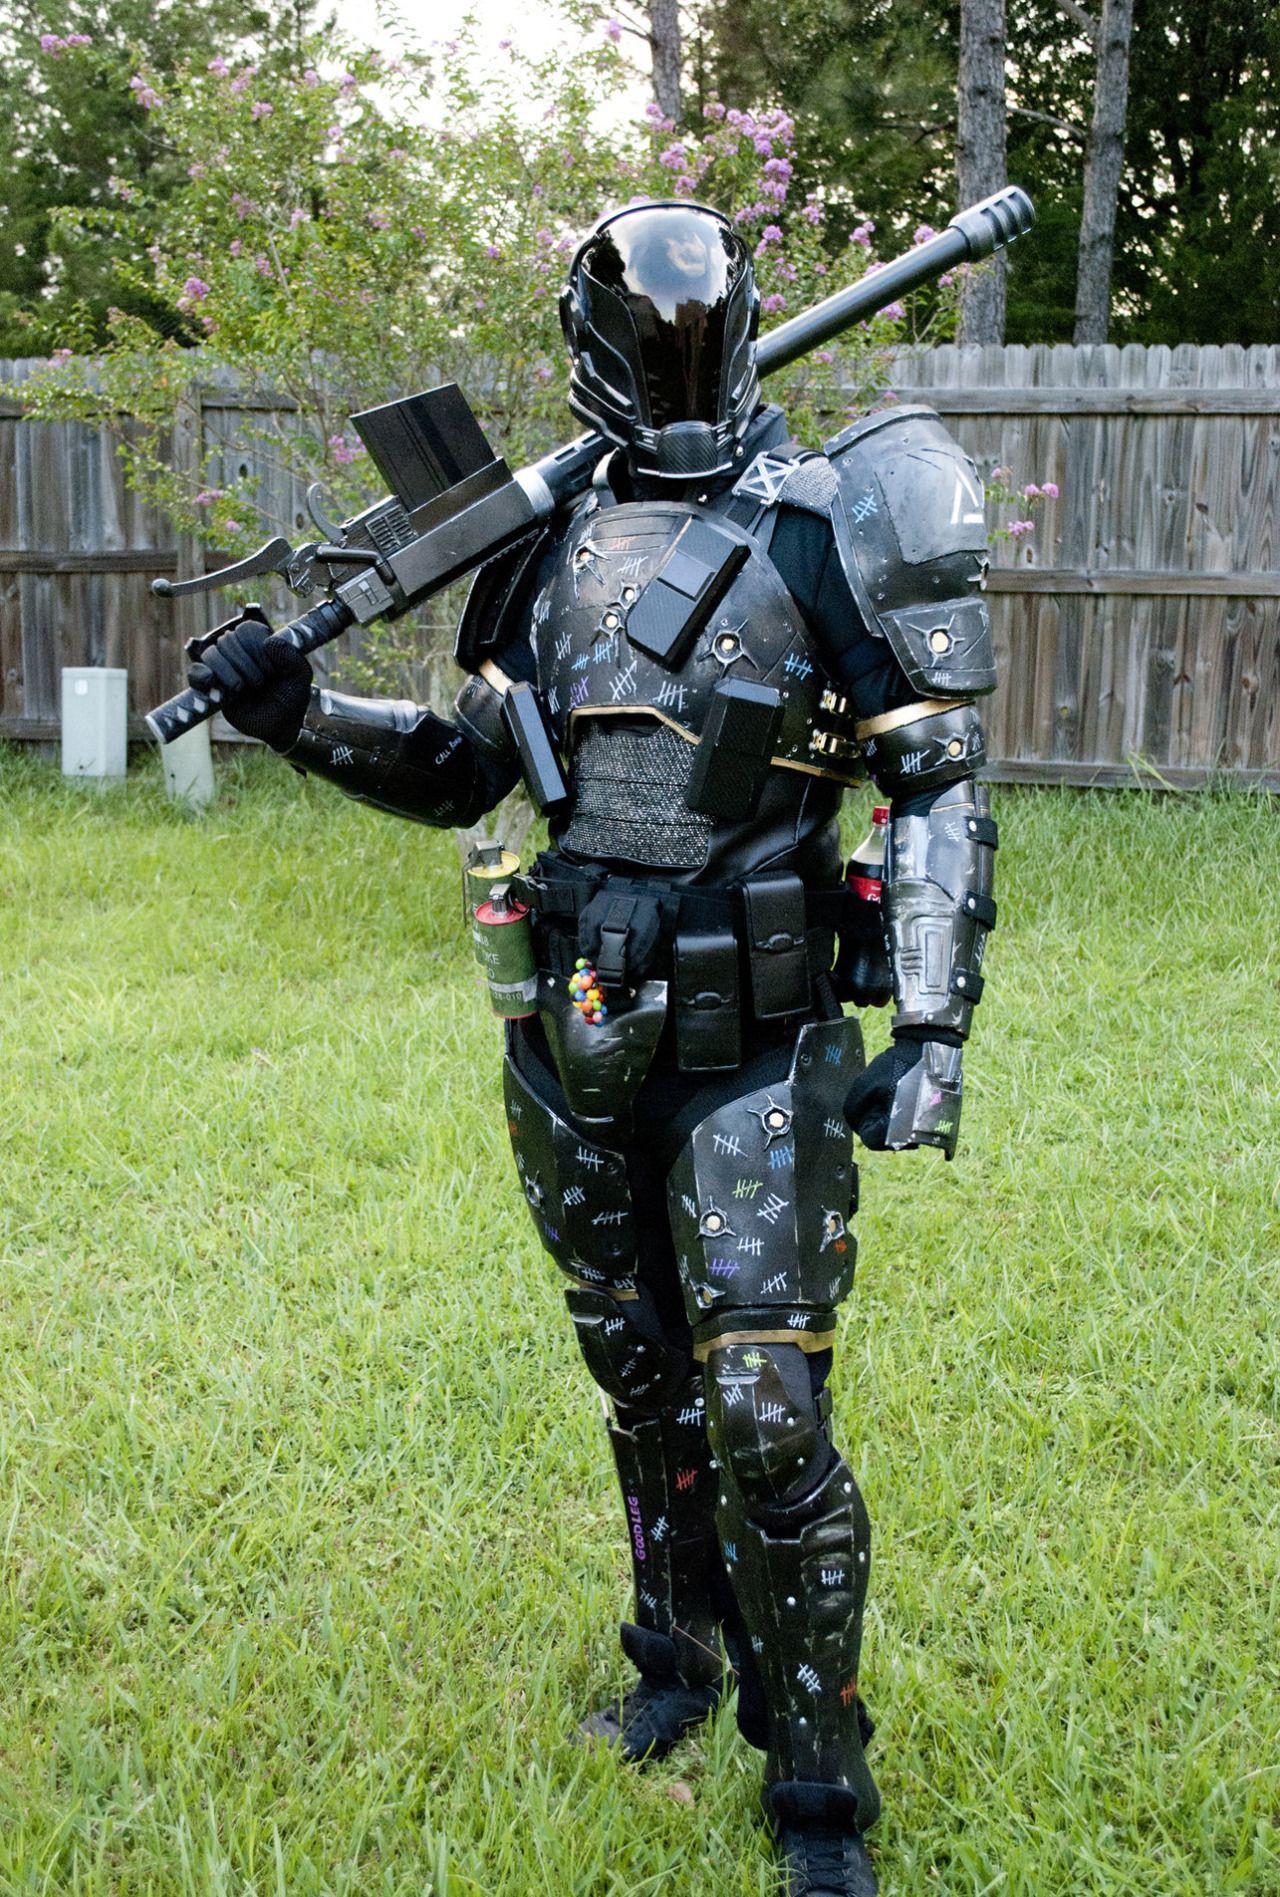 1_gabriel-last-man-standing-cosplay-sci-fi-1955723.jpg